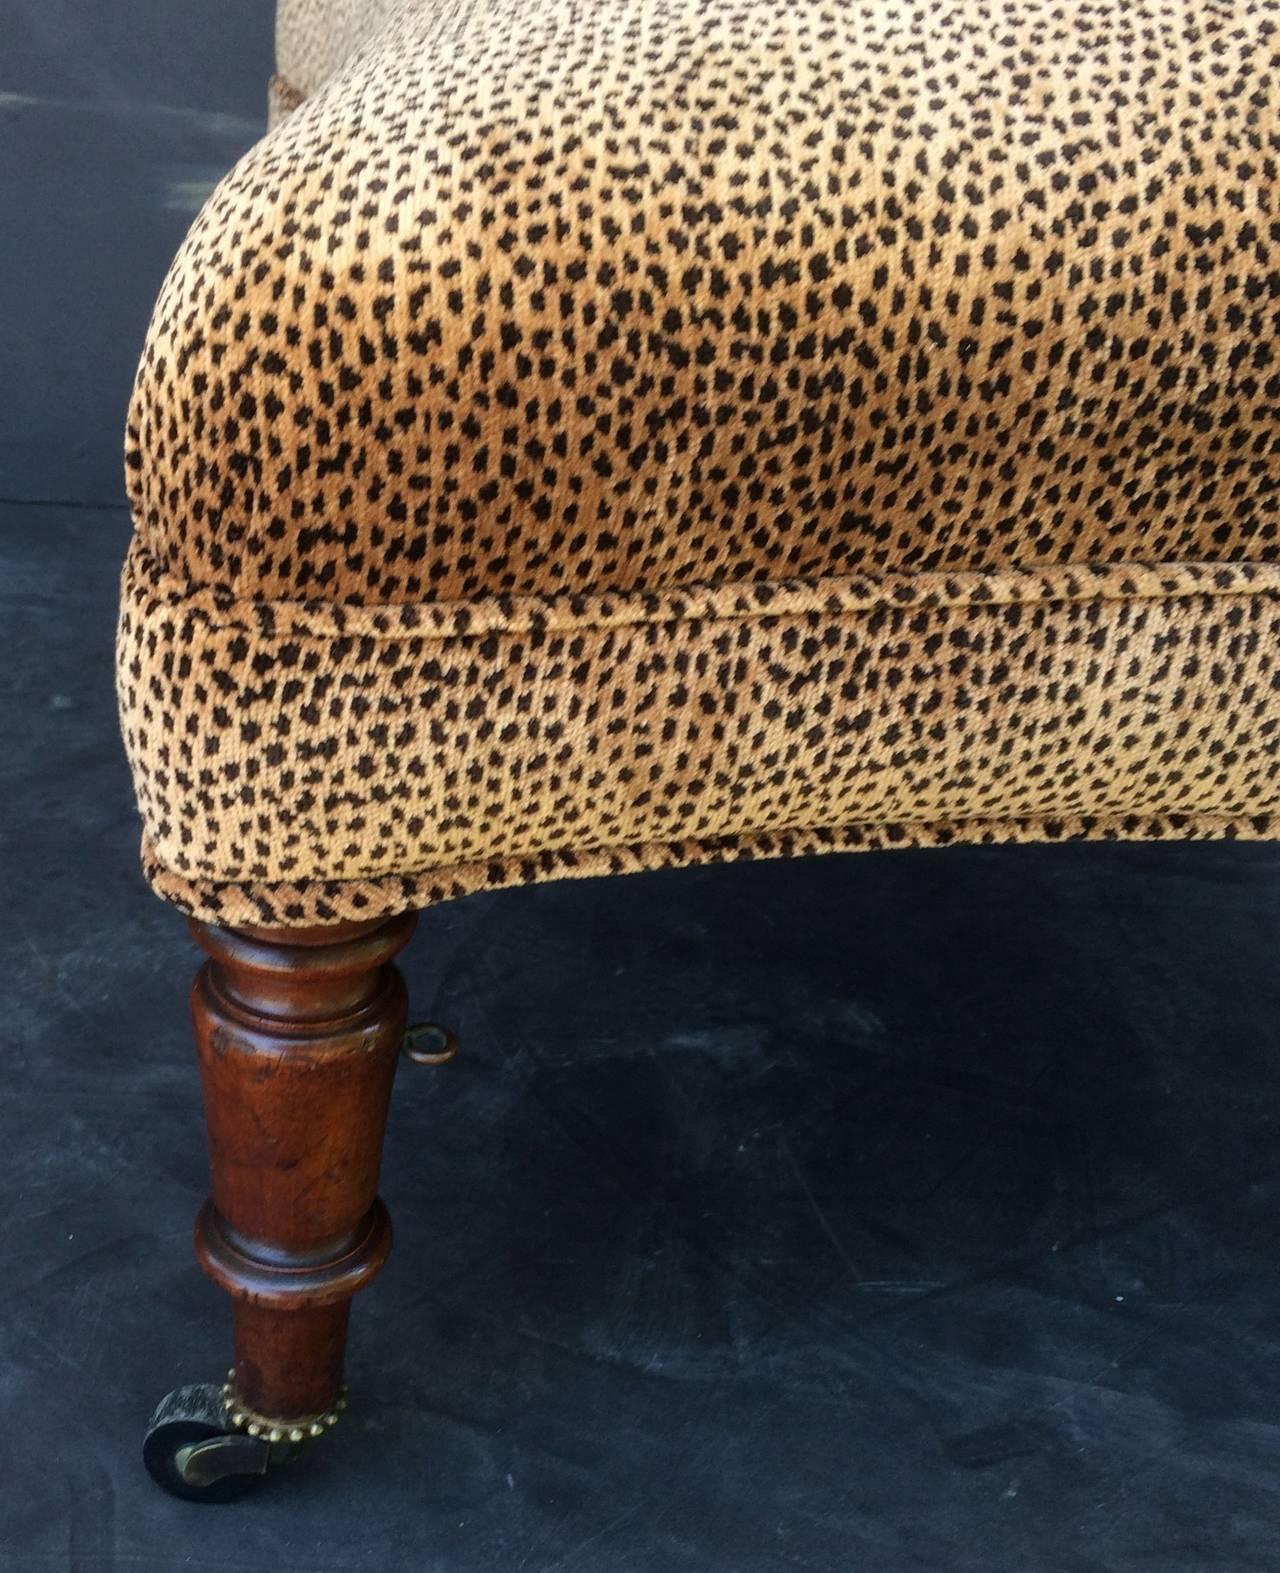 English Upholstered Ottoman On Mahogany Legs At 1stdibs